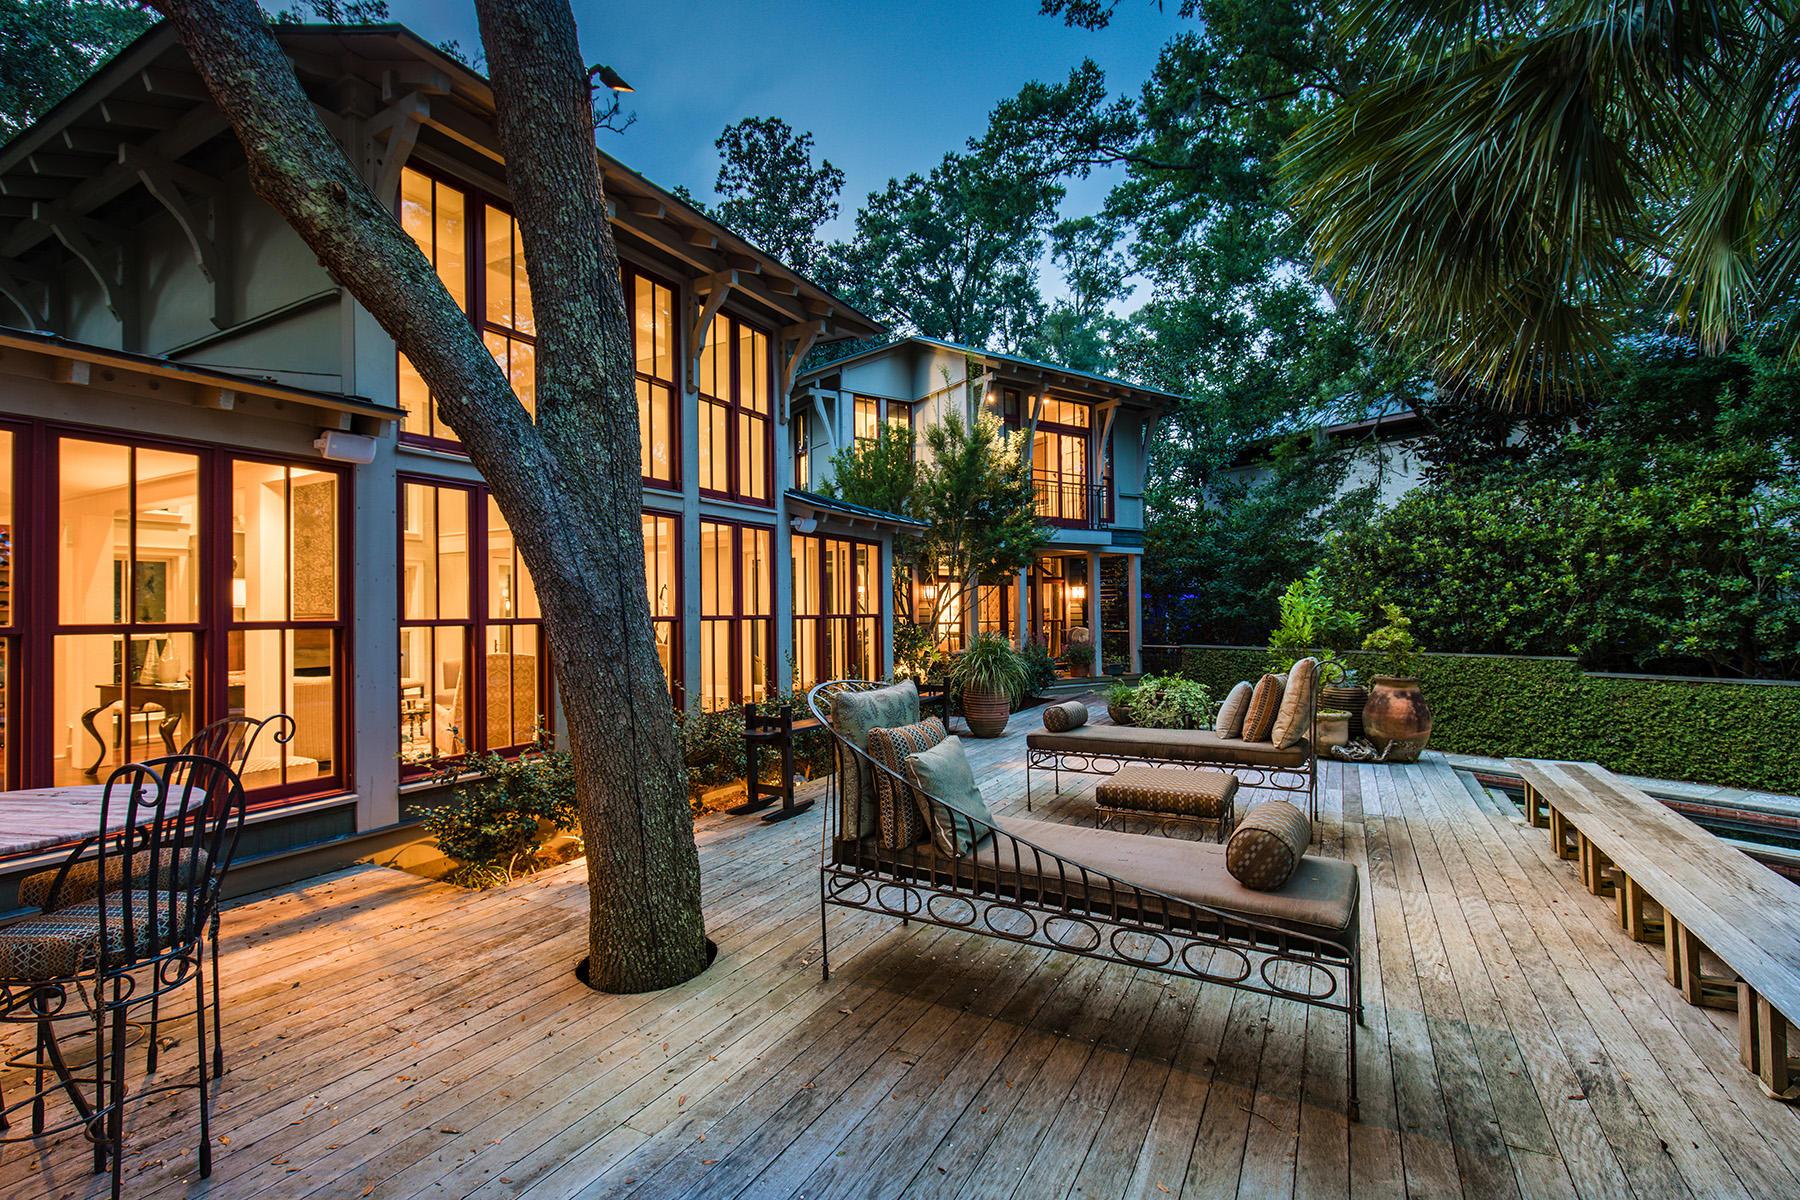 Ellis Oaks Homes For Sale - 672 Ellis Oak, Charleston, SC - 4